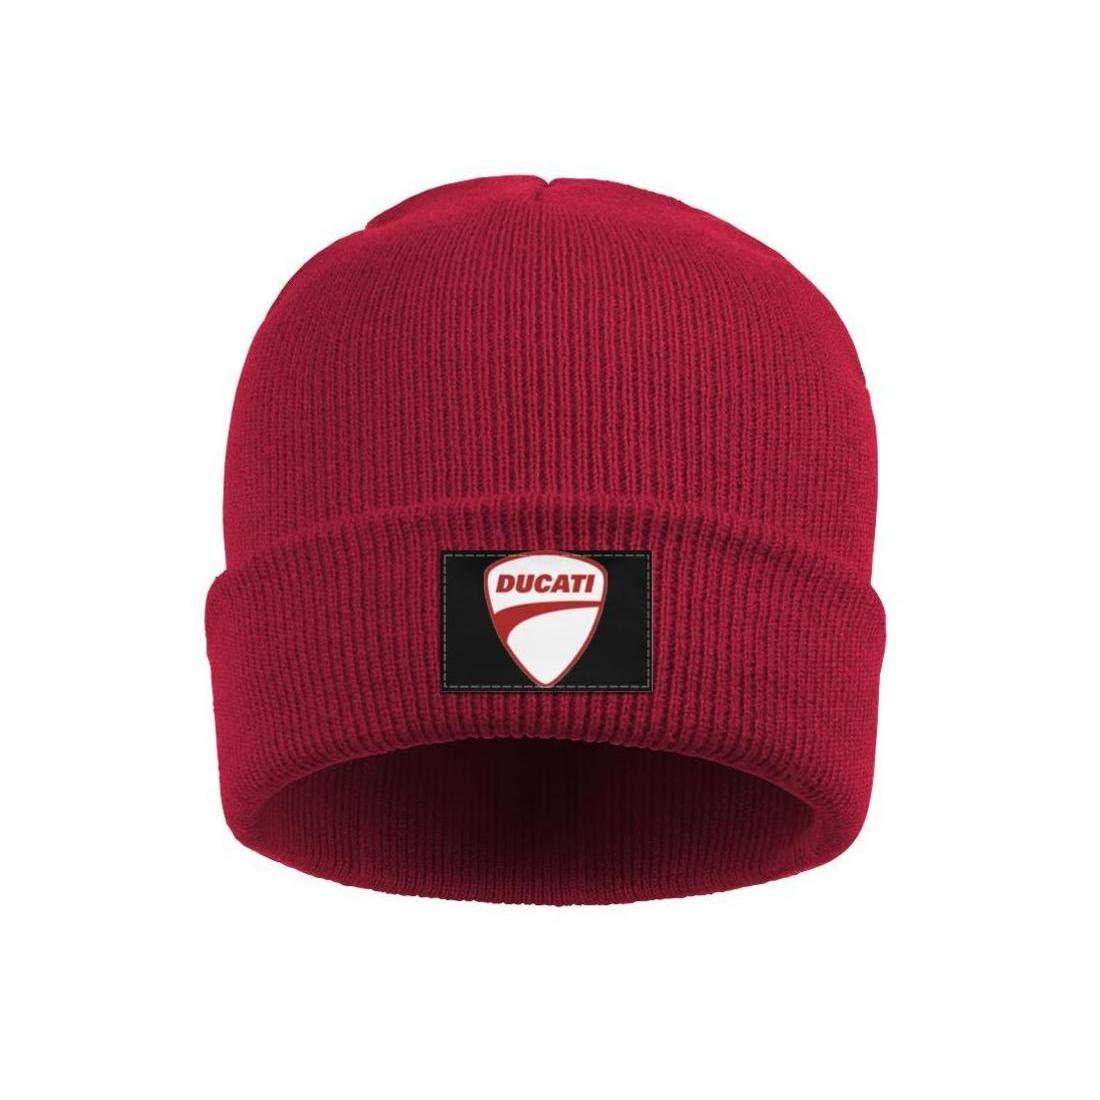 Wool Beanie Cap Knit Cap Fine Knit Knitting Beanie HatsSki Warm Mens Ducati-Motorcycle-Logo